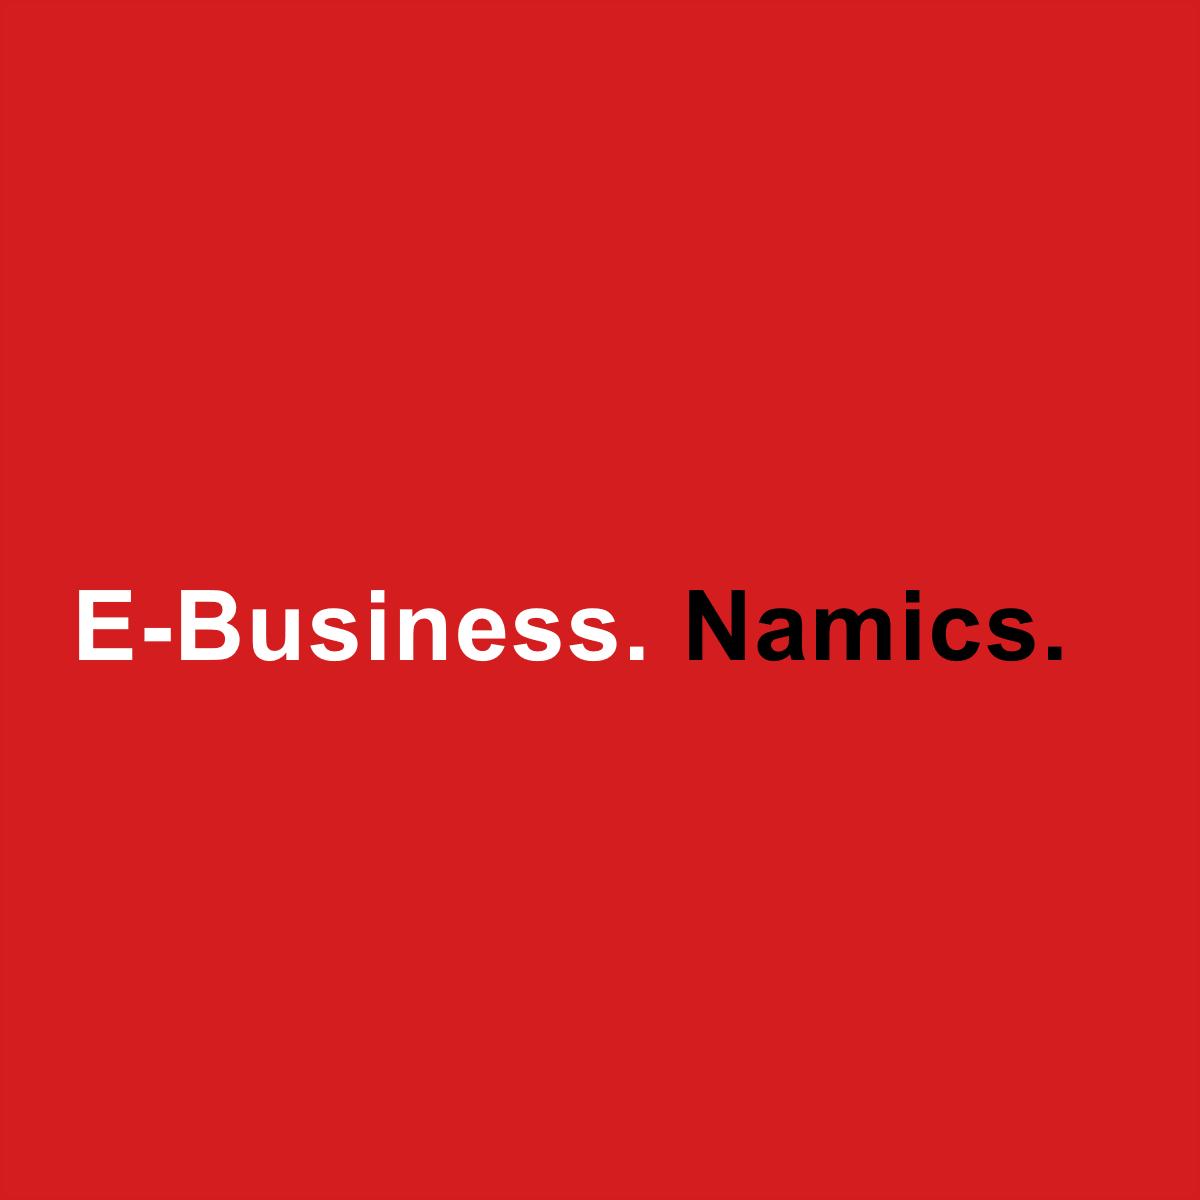 namics-ag-logo-talendo.png